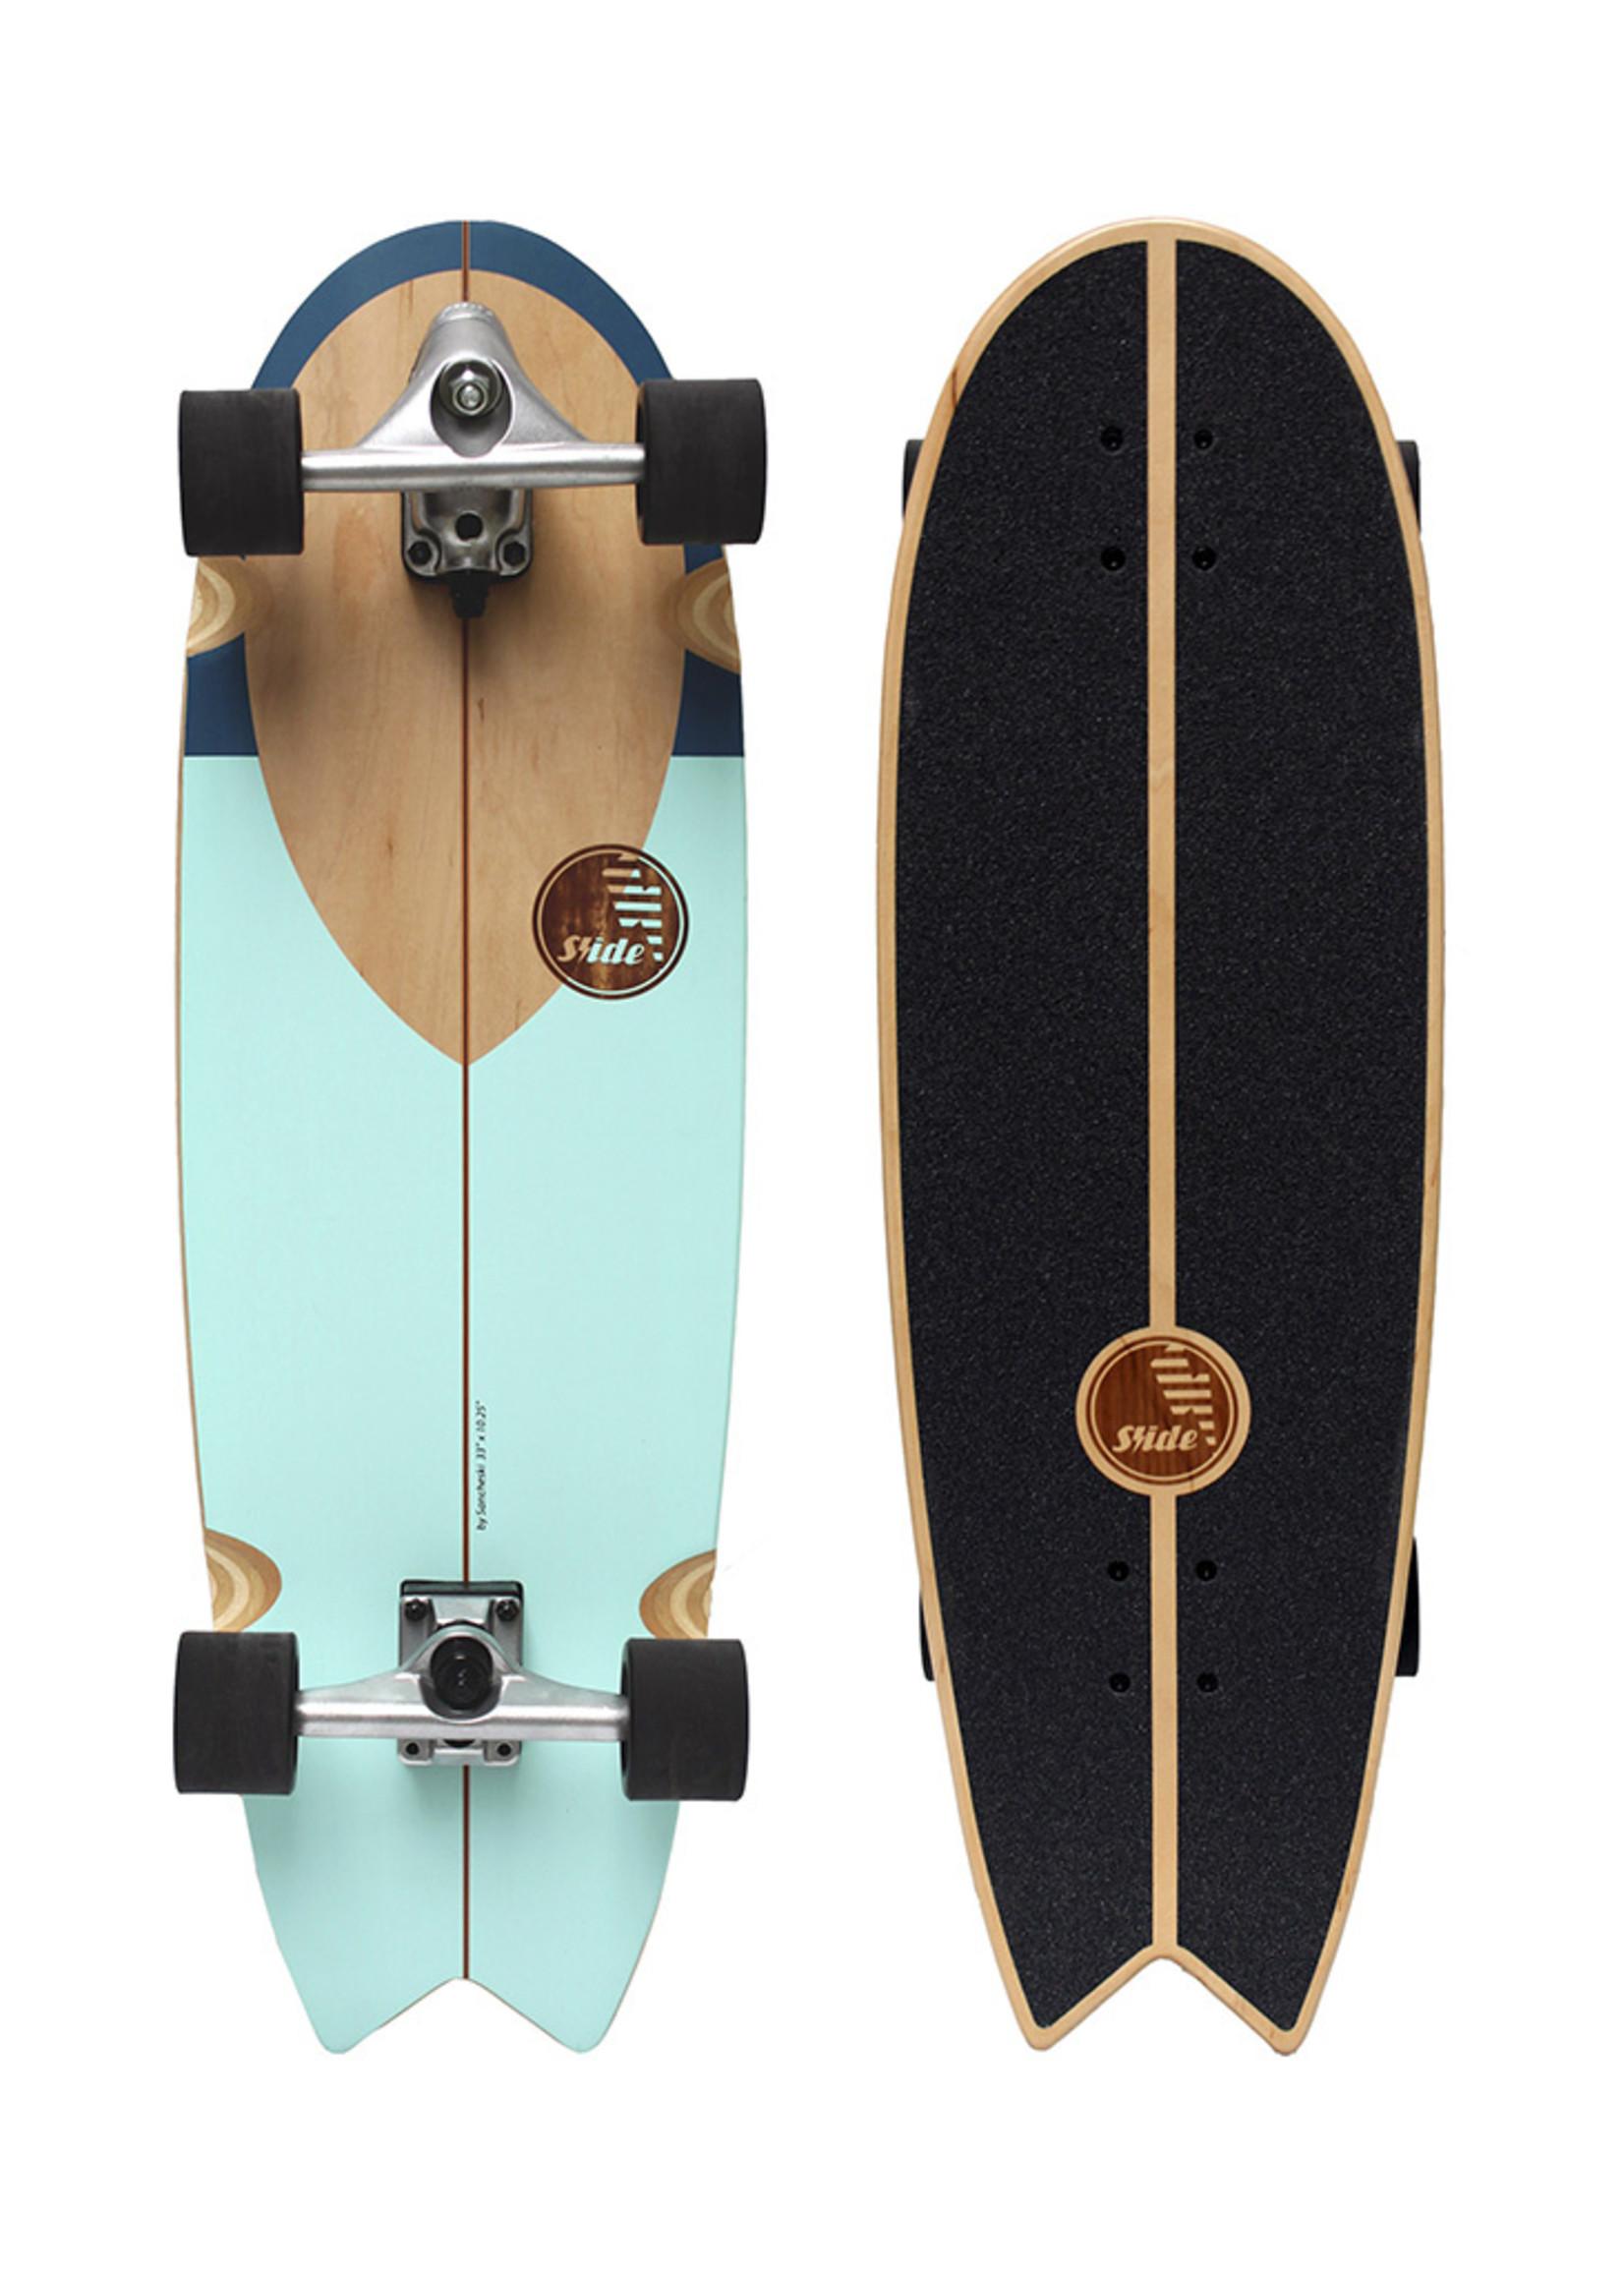 "Slide Surfskates Slide Swallow Noserider 33"" Surfskate Complete"